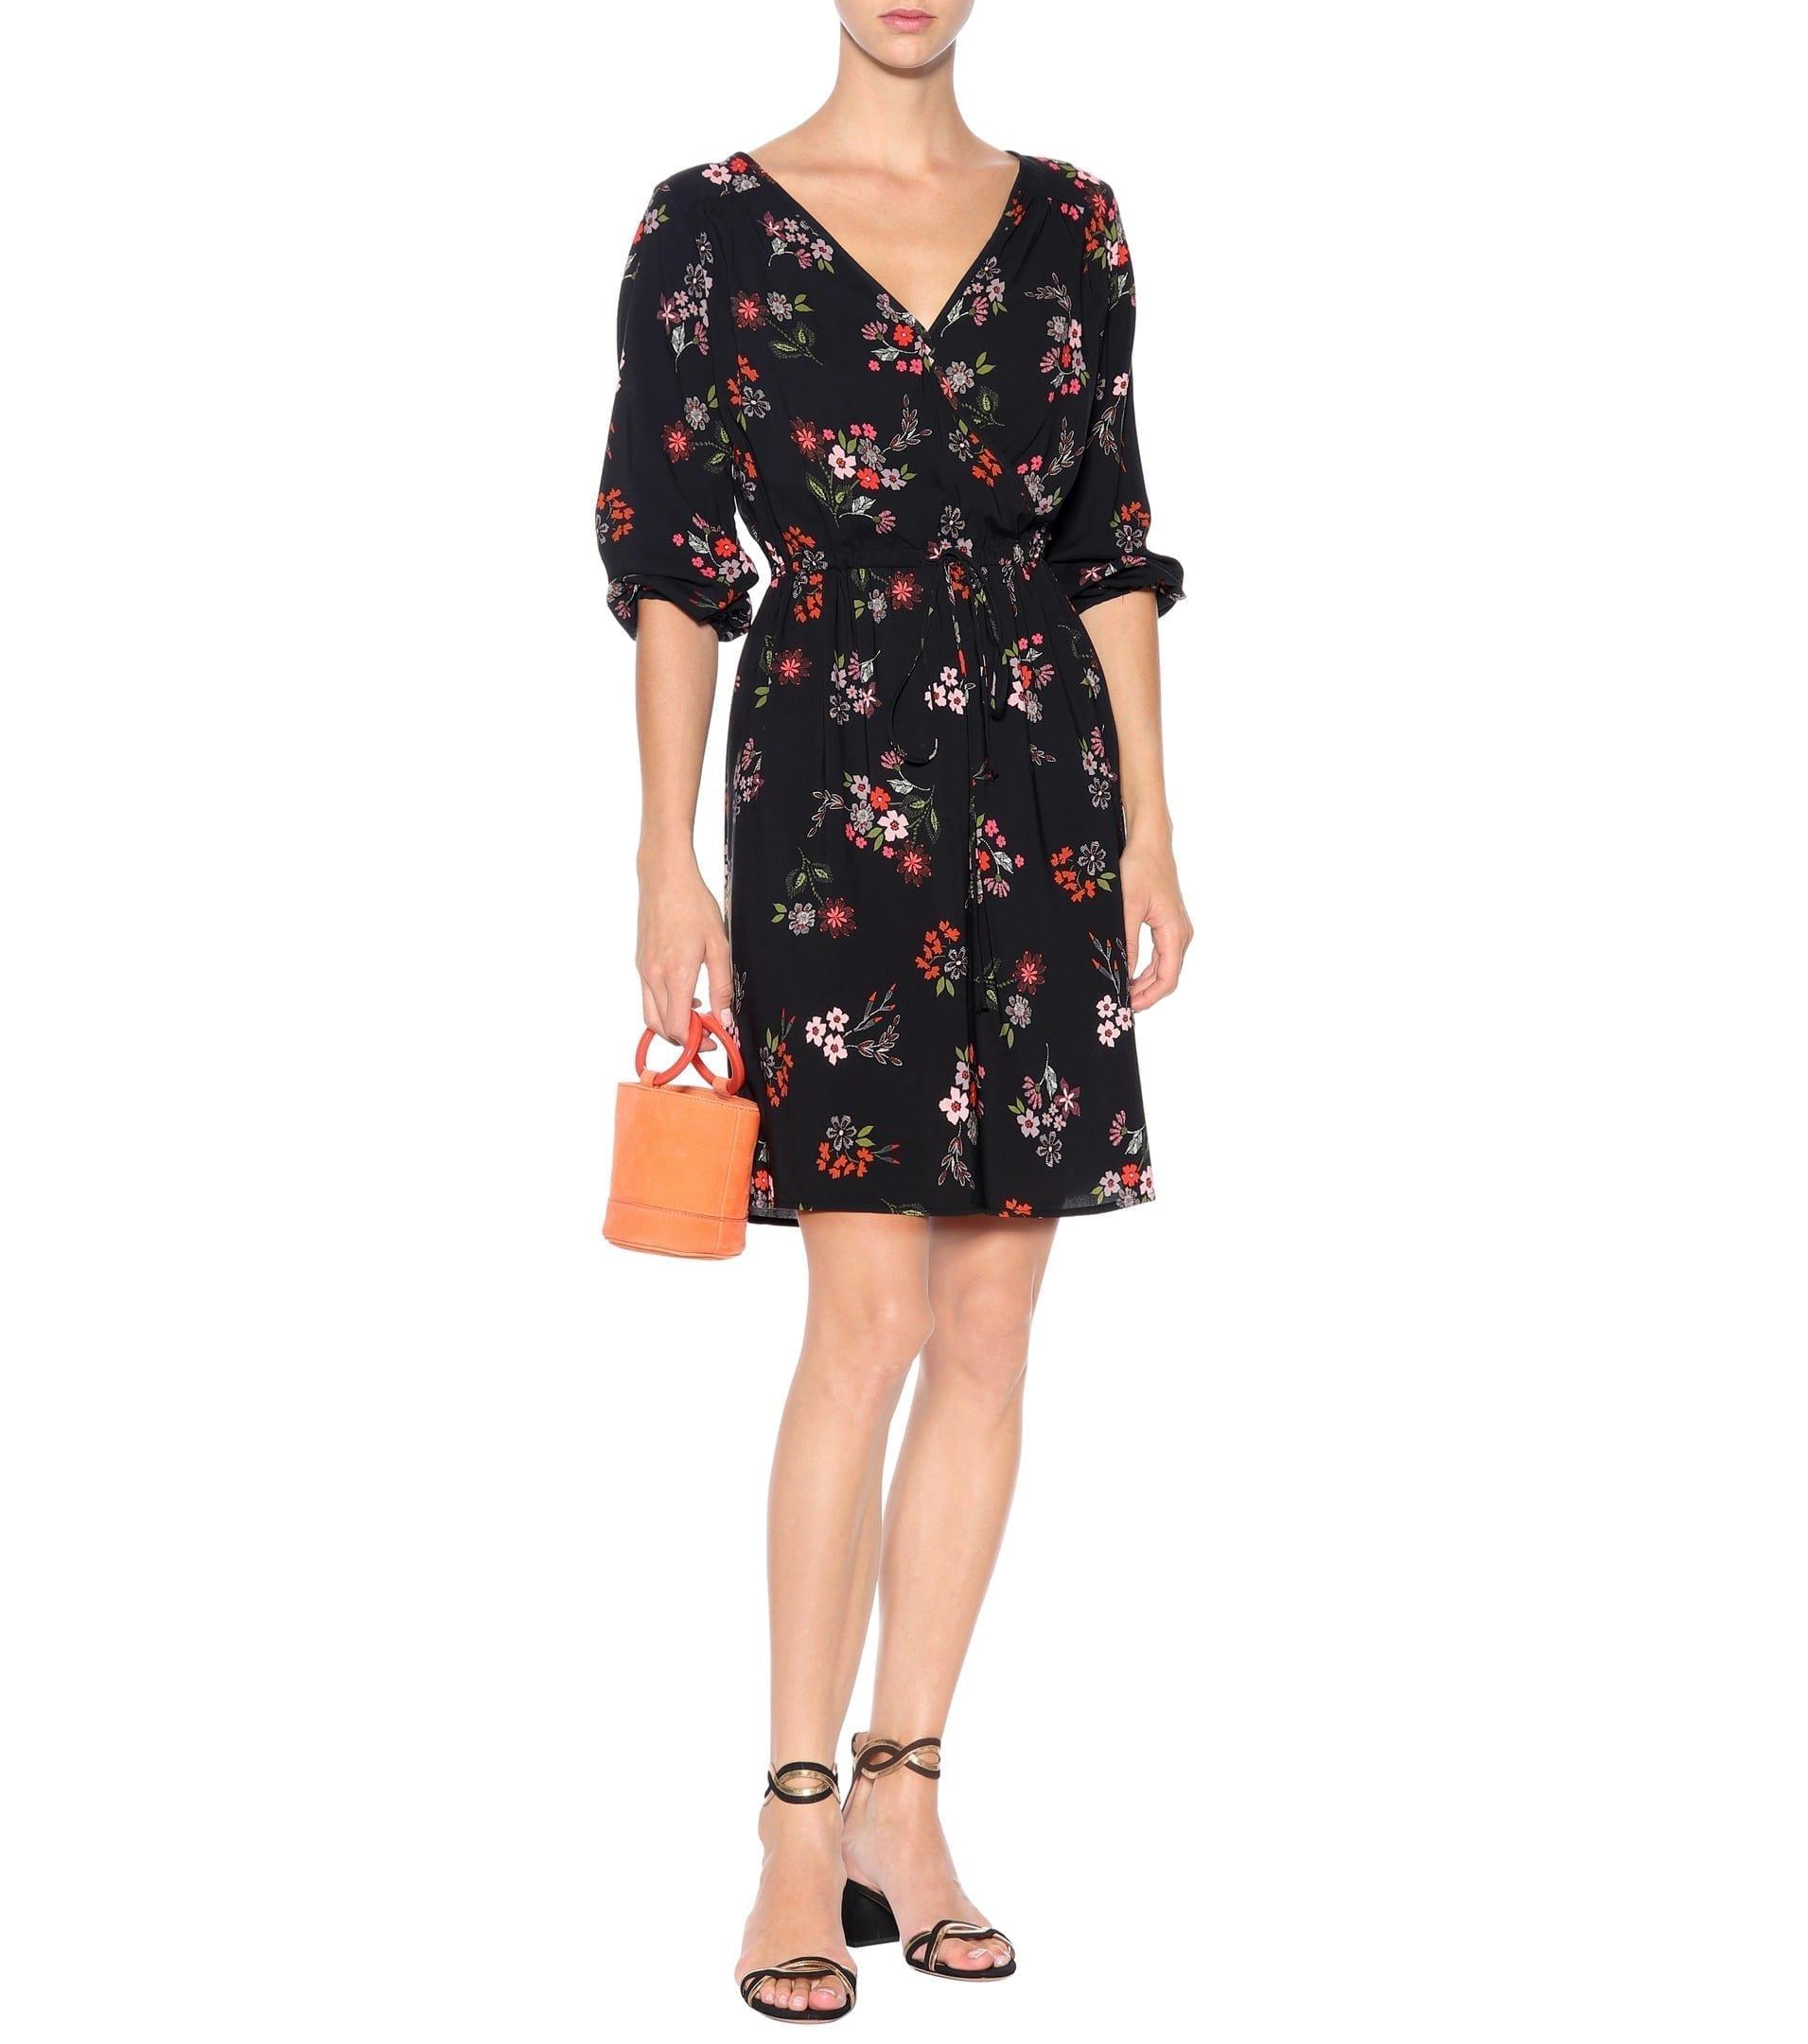 VELVET Wrap Effect Akira / Floral Printed Dress